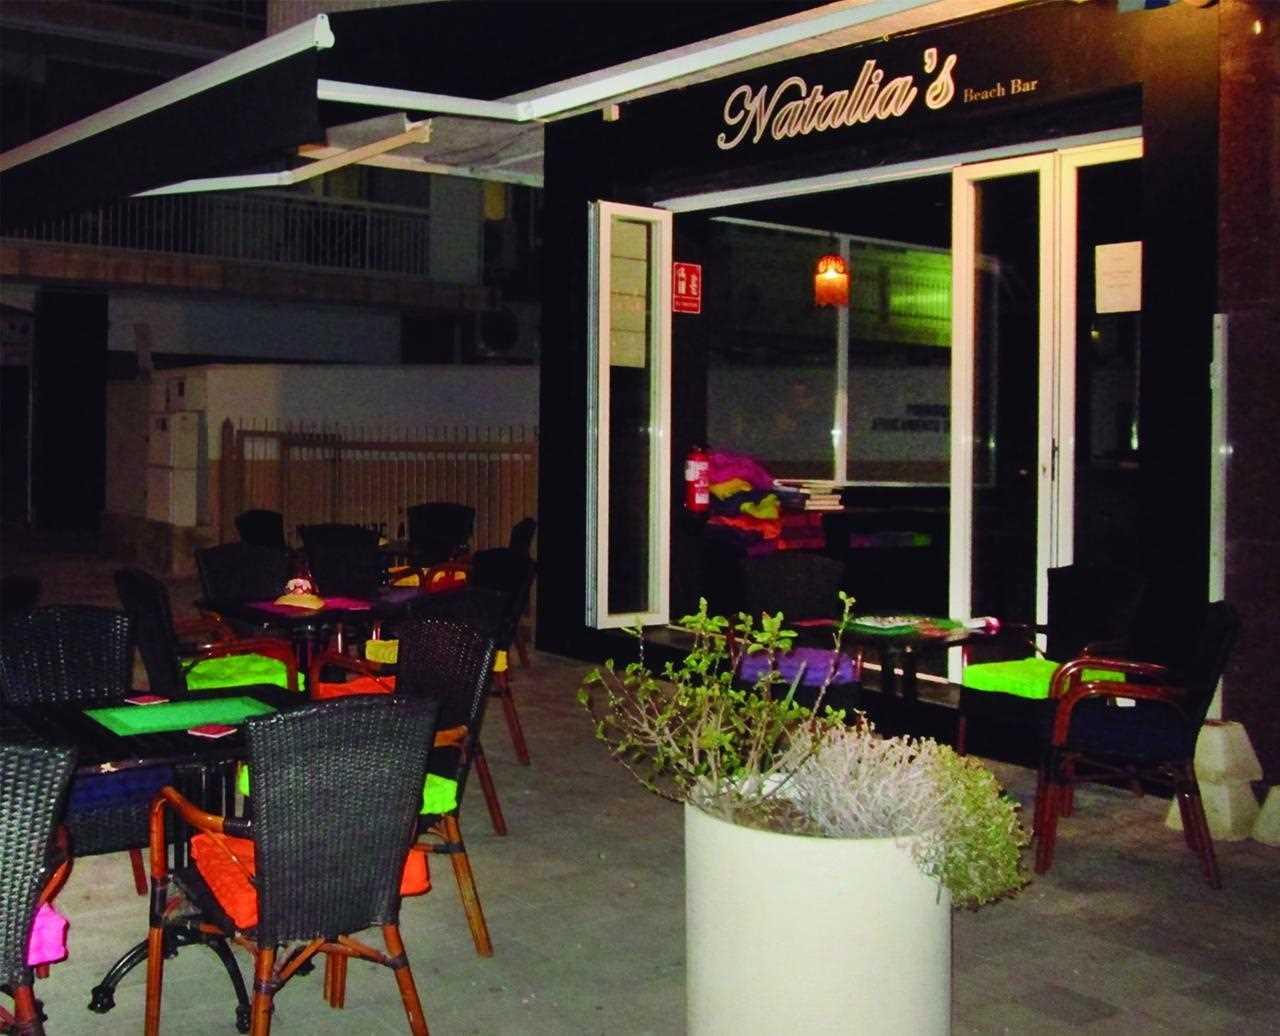 Natalia's Beach Bar